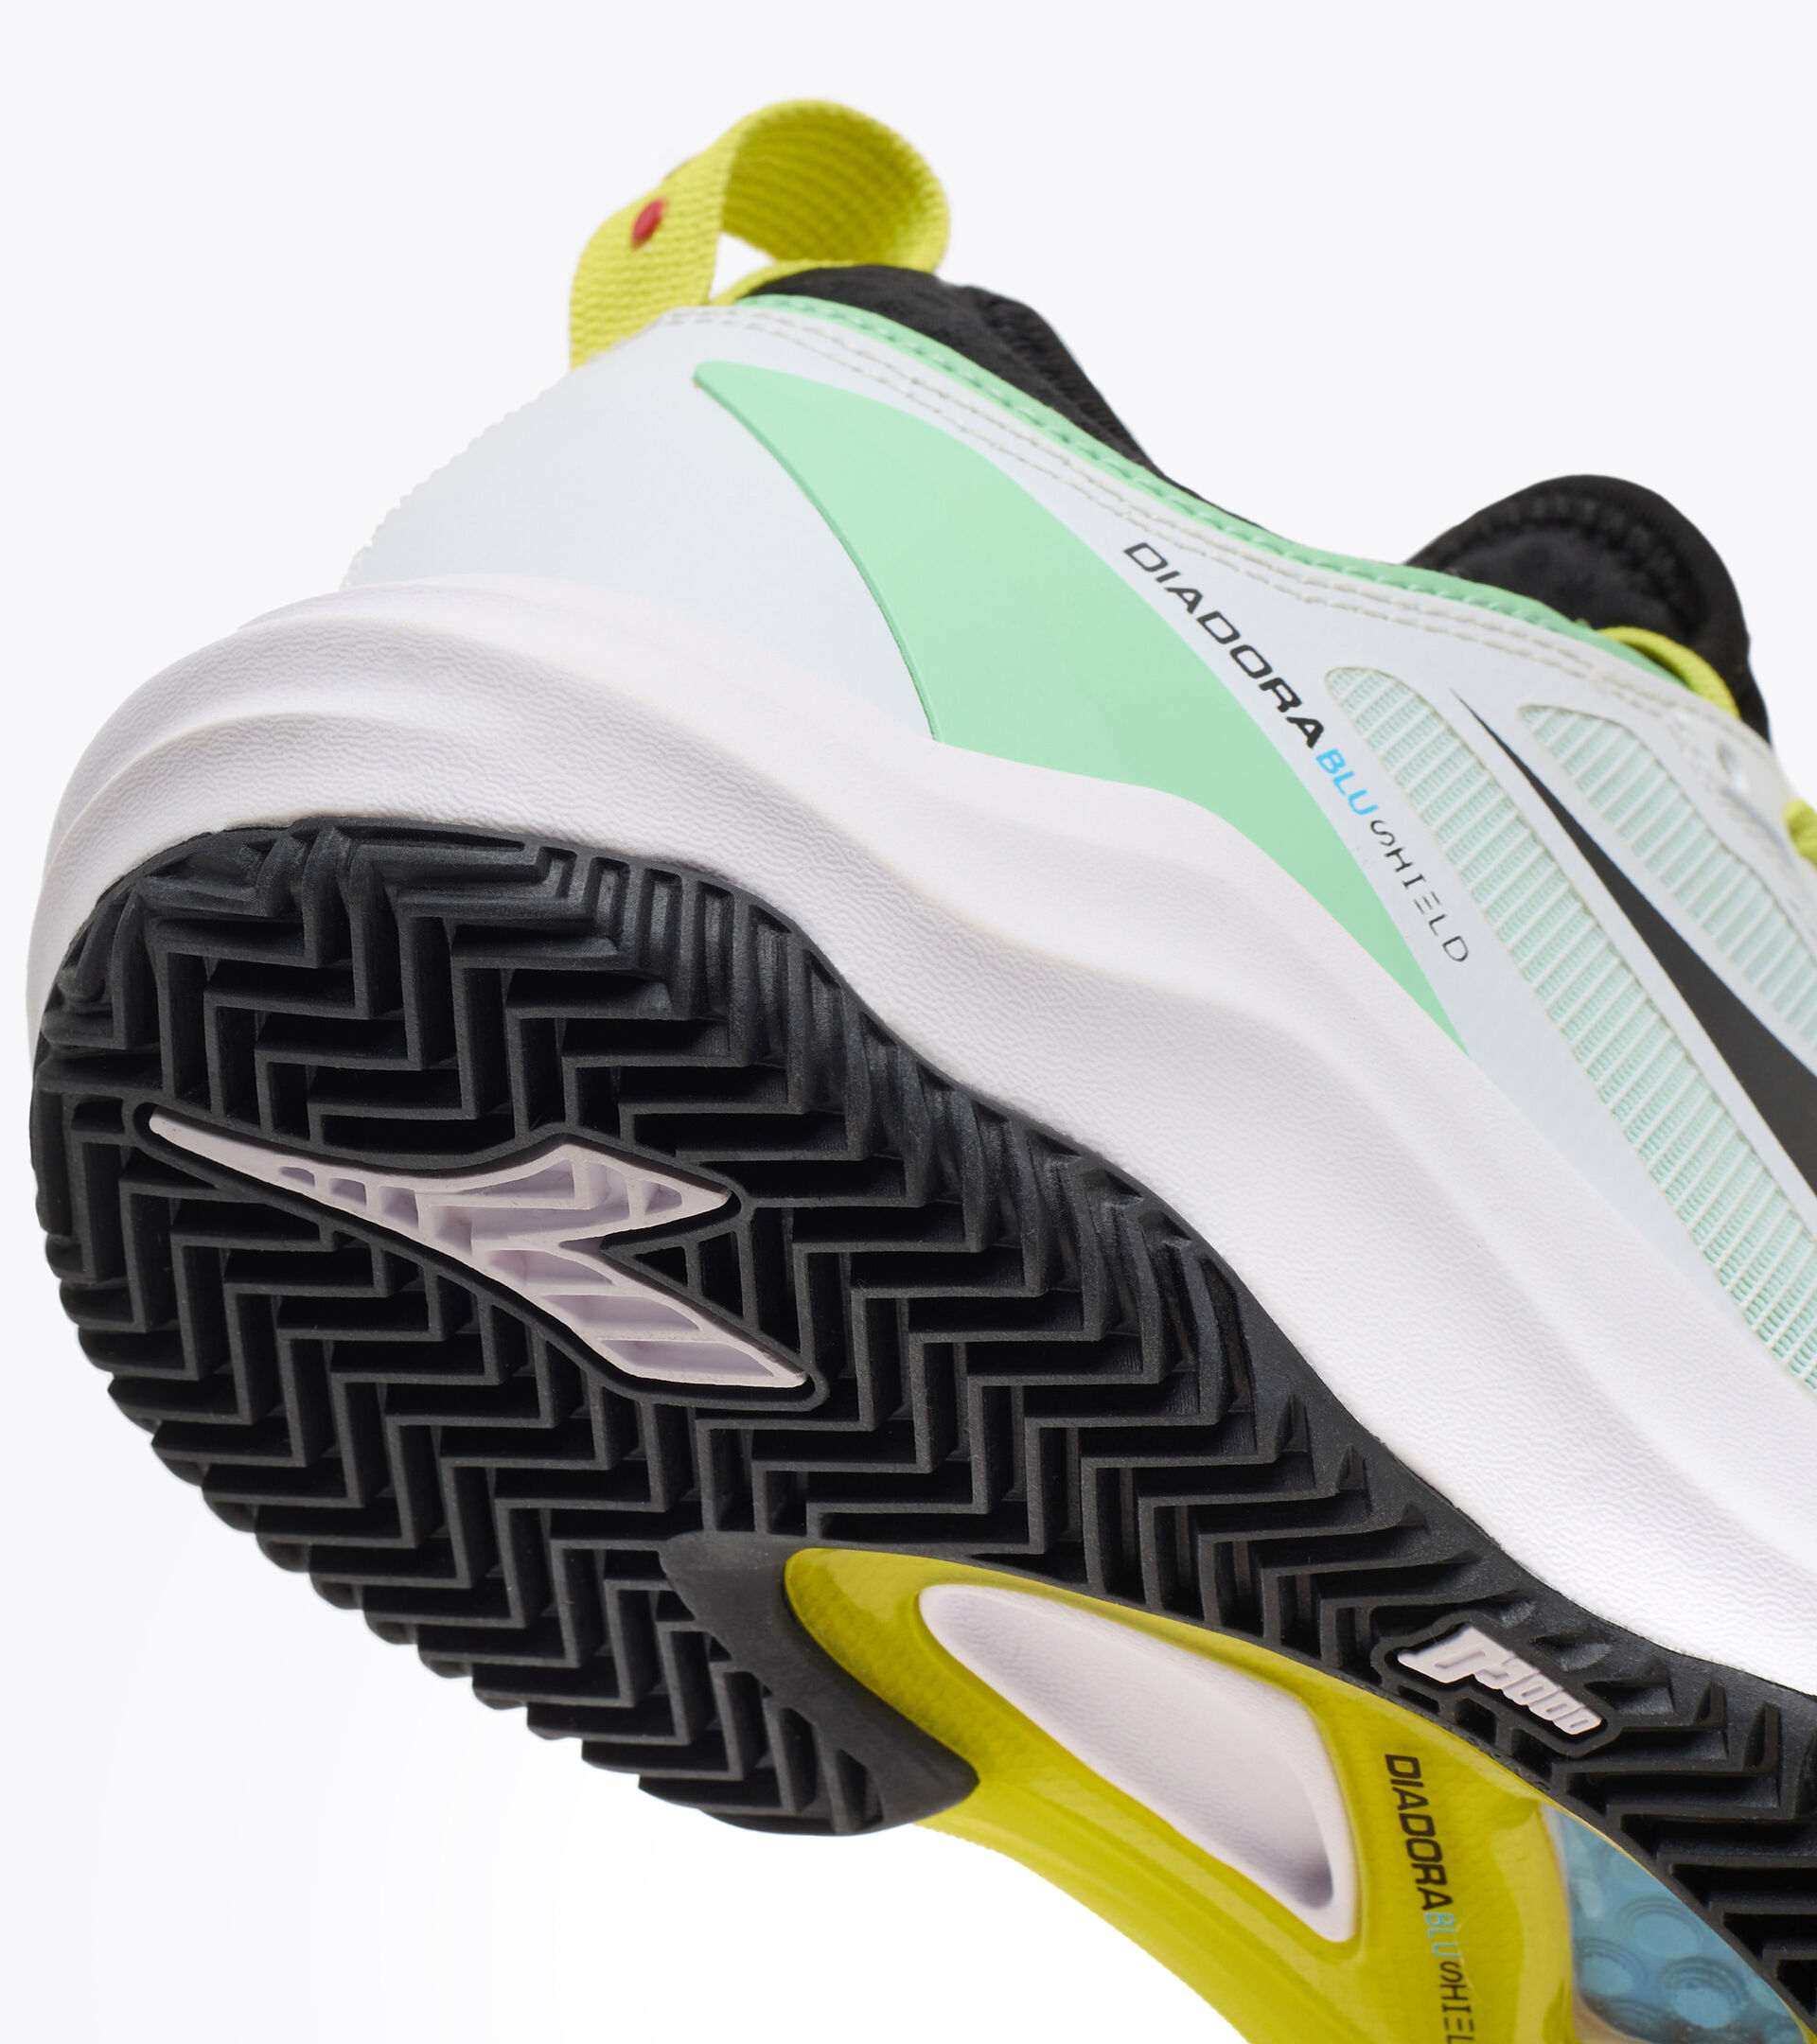 Footwear Sport DONNA SPEED BLUSHIELD FLY 3 + W CLAY WHITE/BLACK/GREEN ASH Diadora